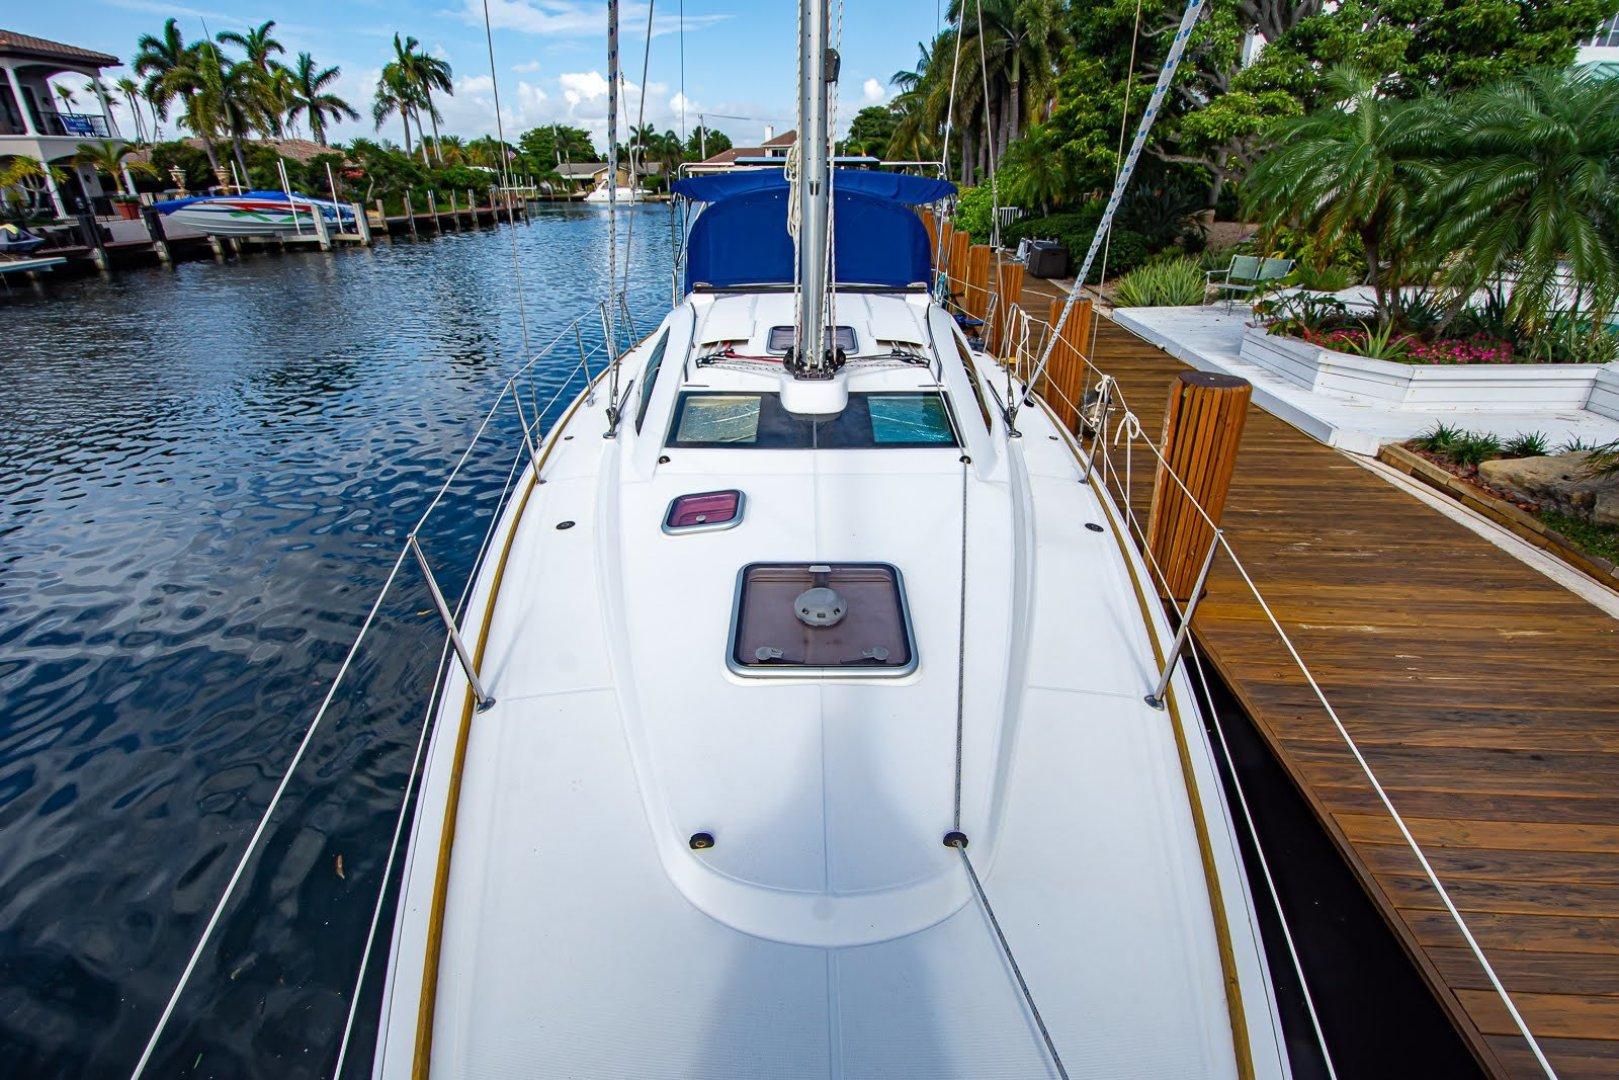 Jeanneau-42DS 2007-Layla Fort Lauderdale-Florida-United States-Jeanneau 42DS-1551268 | Thumbnail